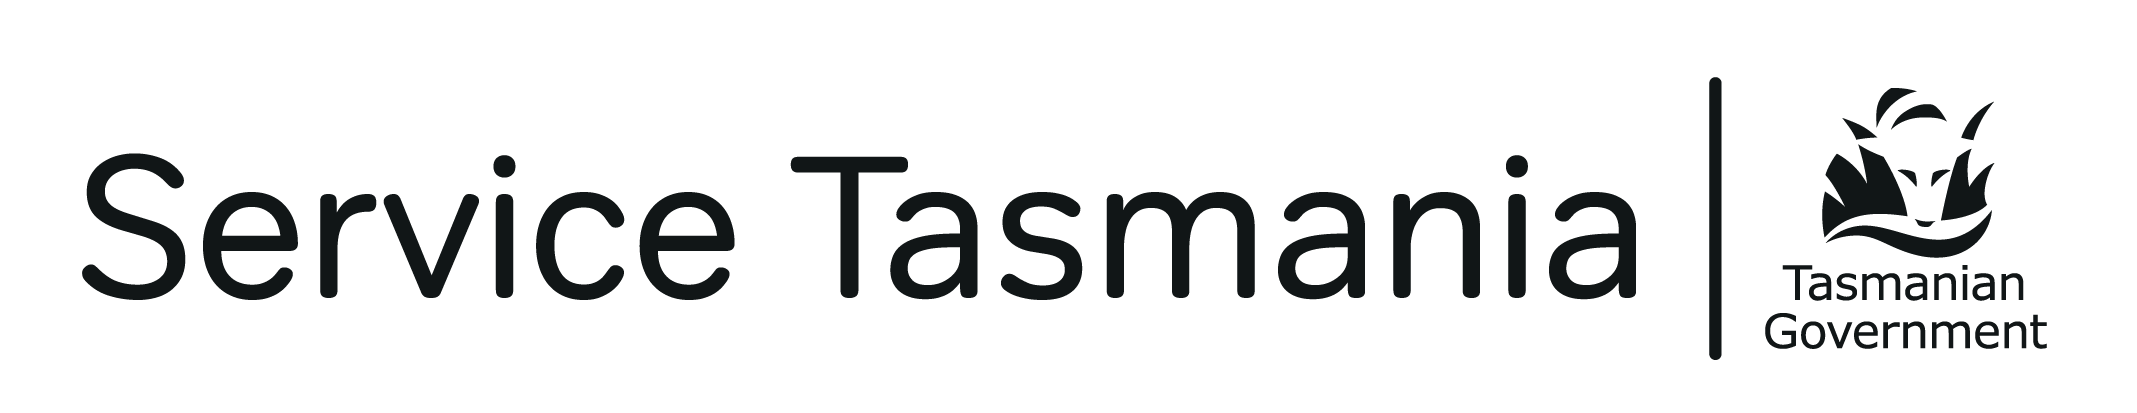 Service Tasmania and Tasmanian Government logos